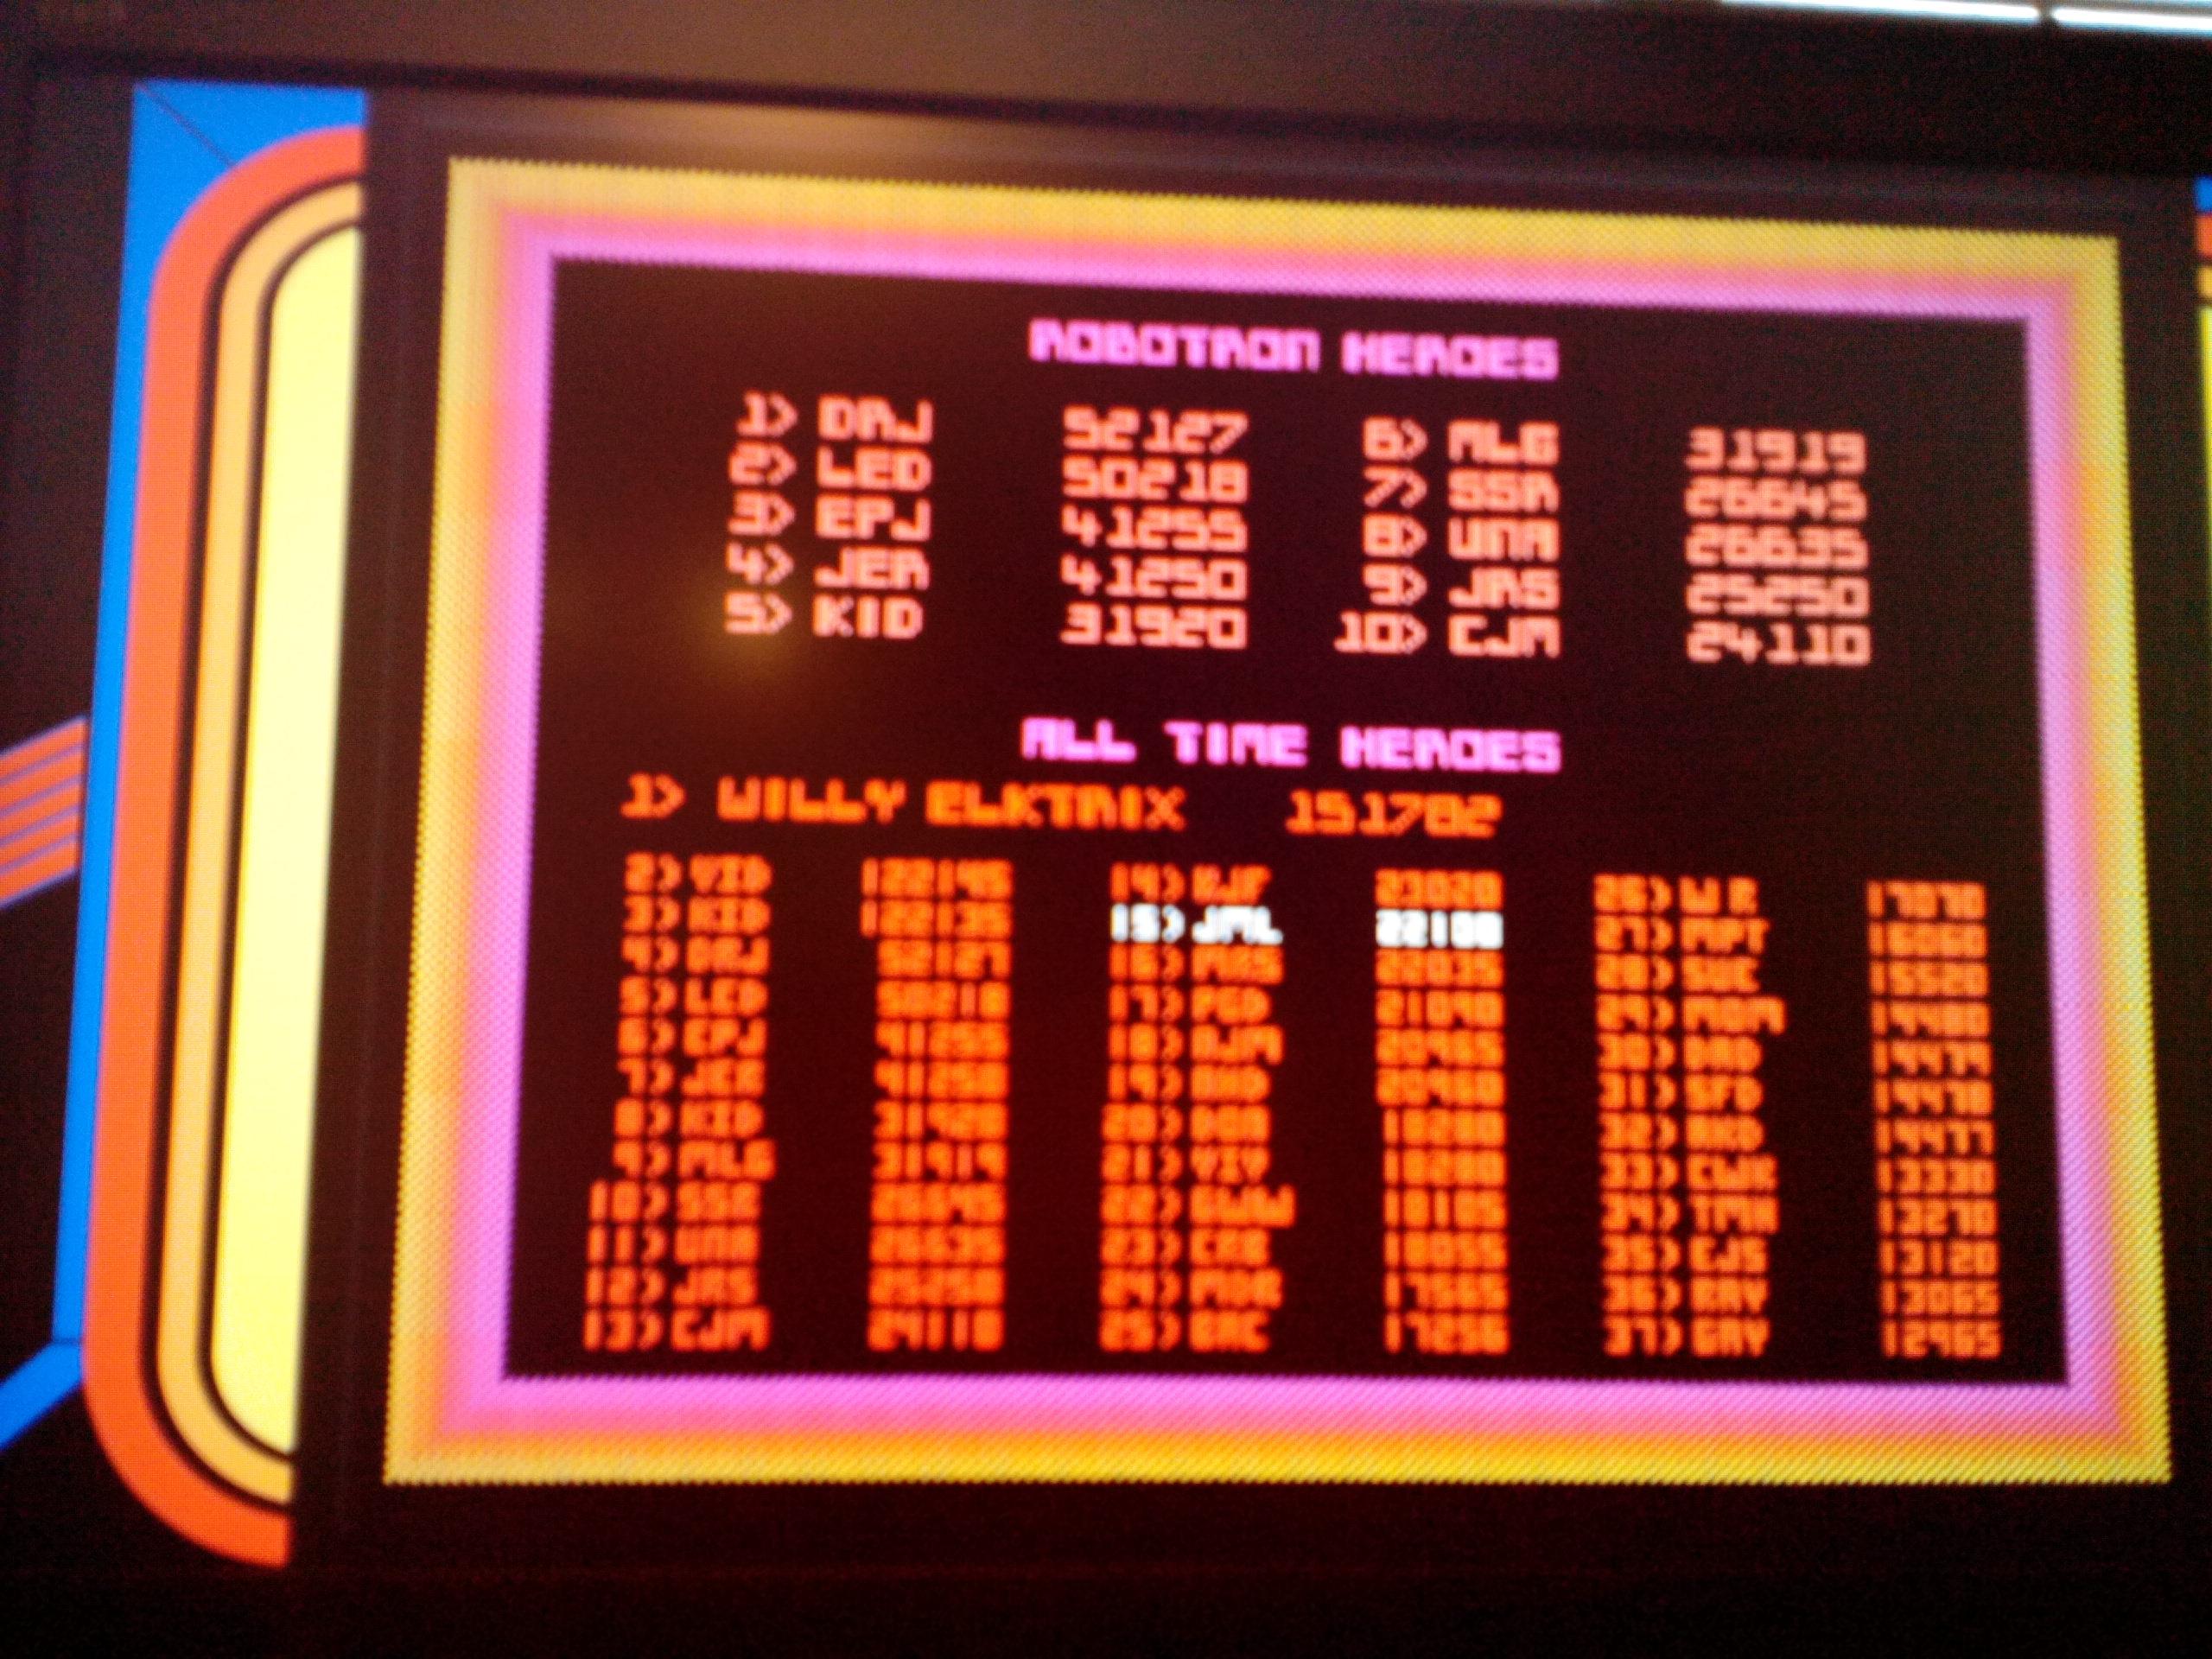 Midway Arcade Origins: Robotron 2084 22,100 points